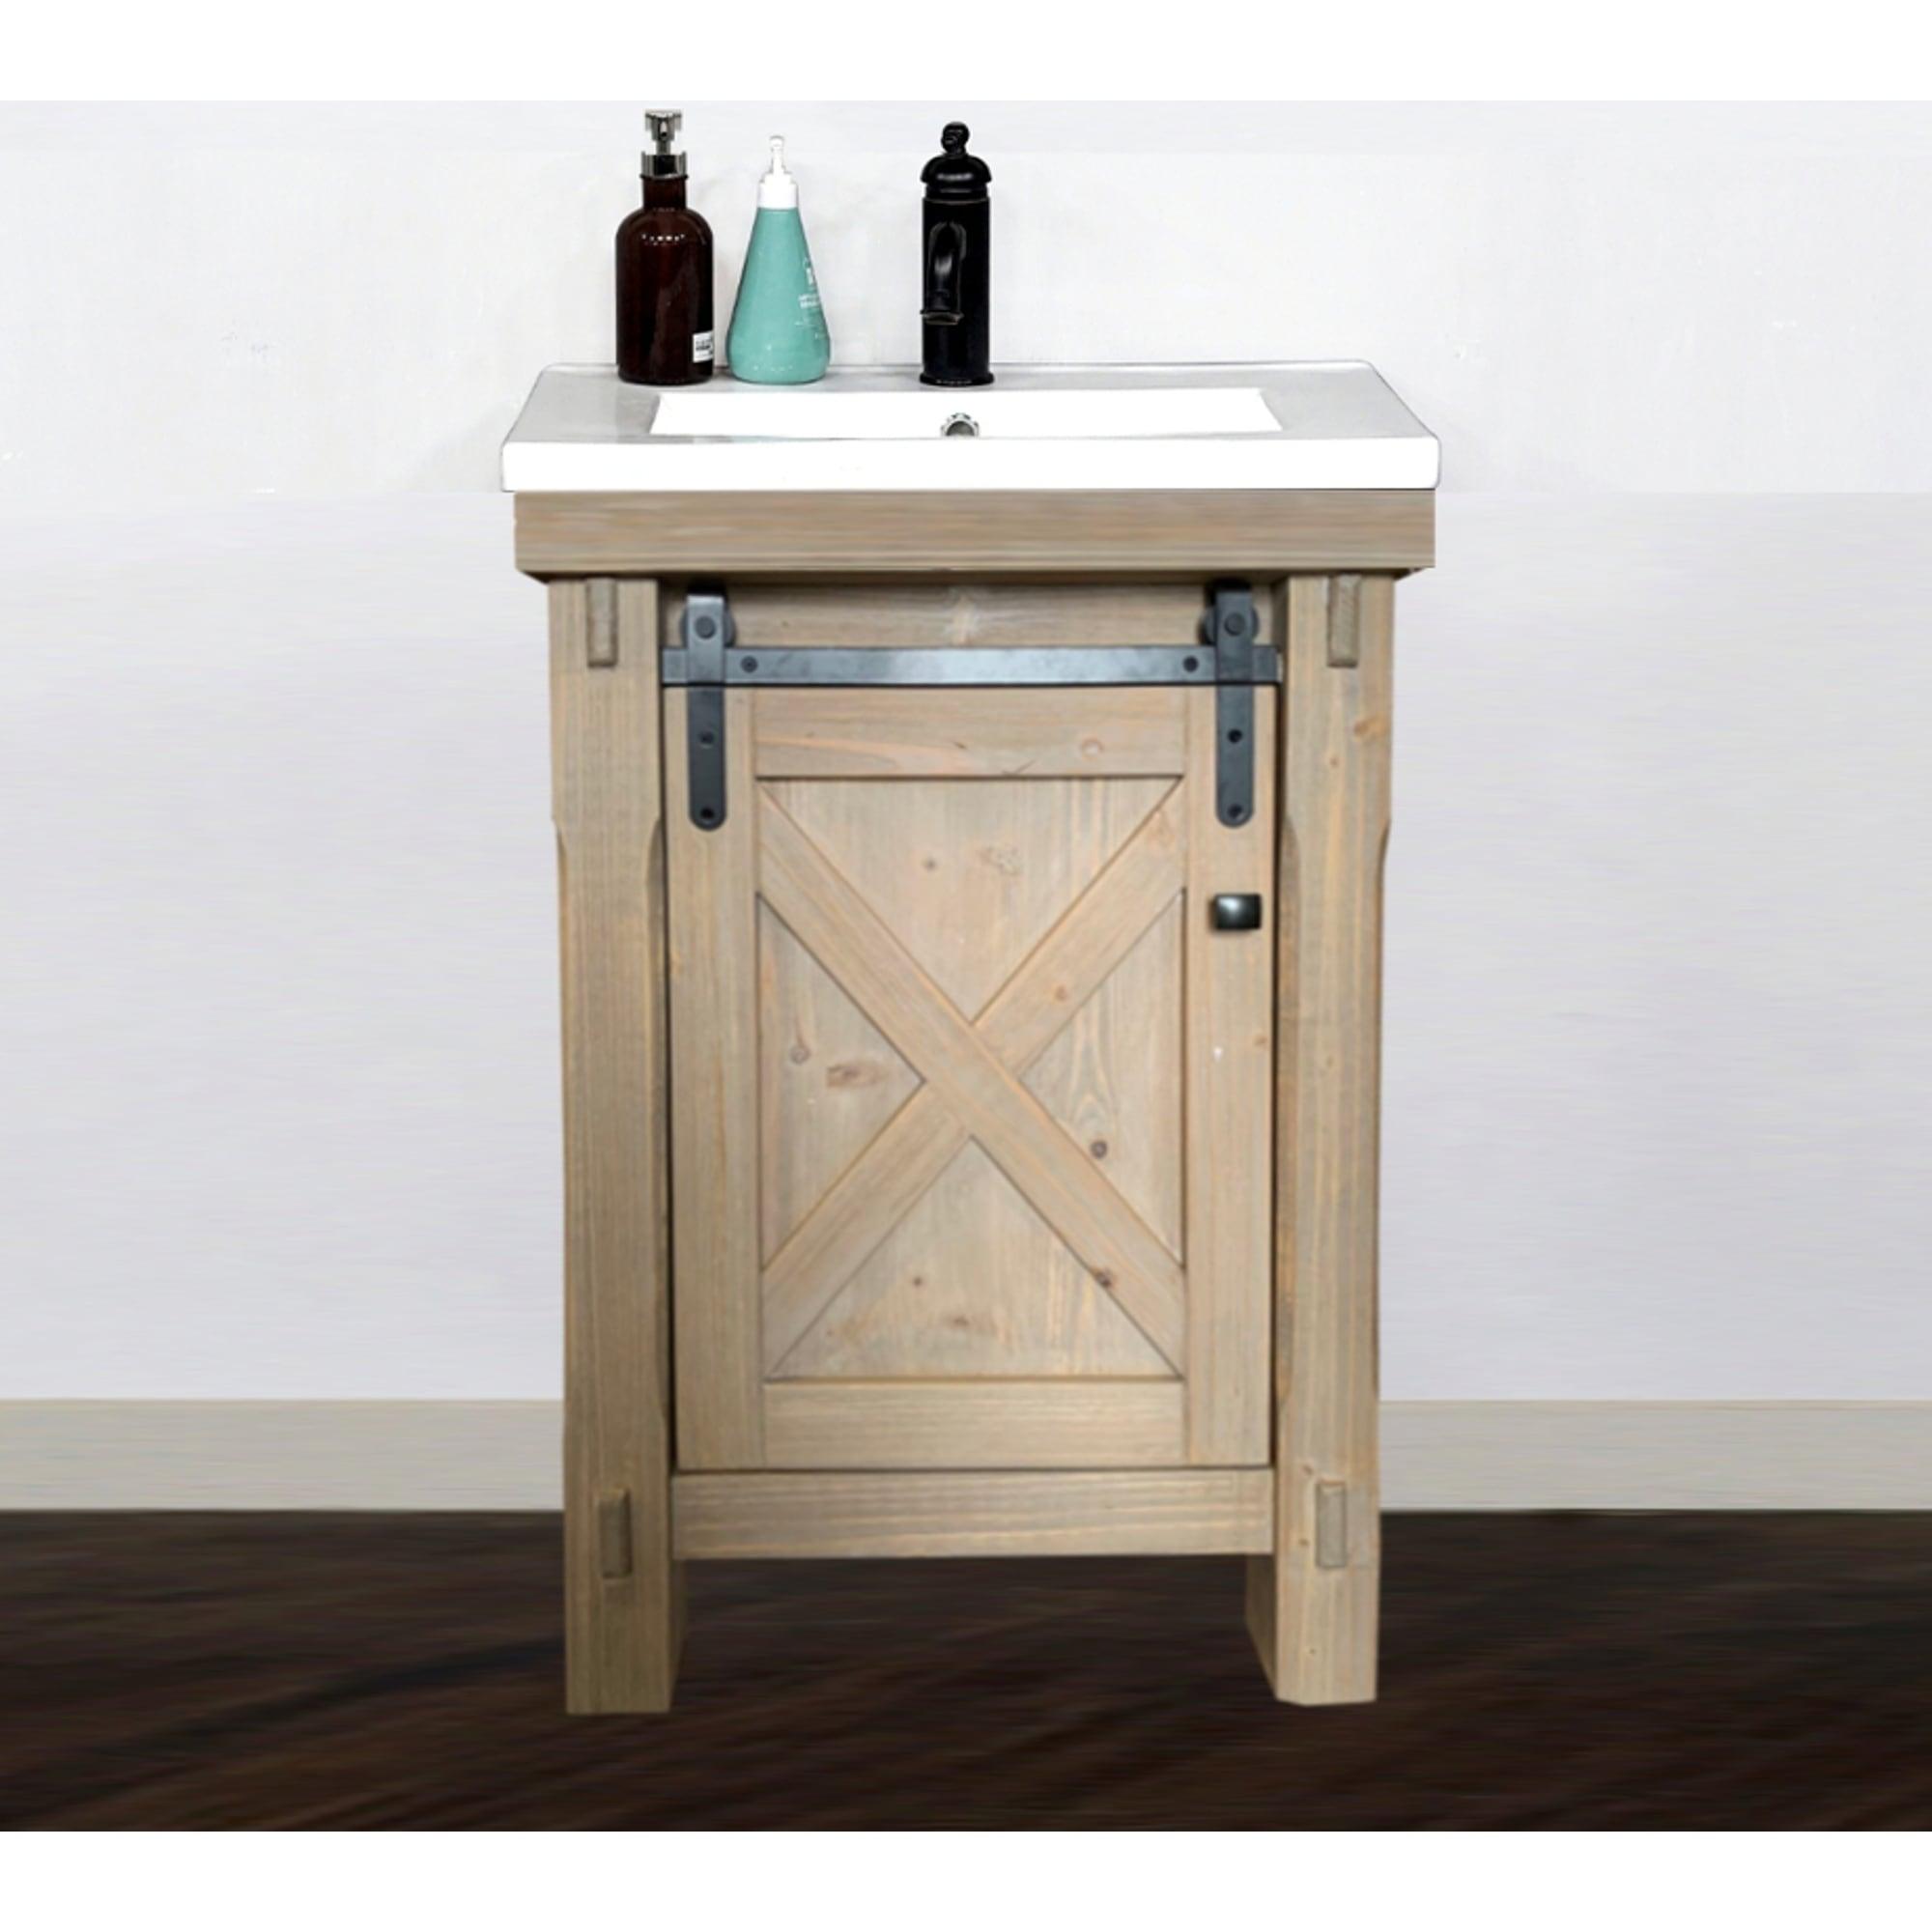 Shop Black Friday Deals On 24 Rustic Solid Fir Barn Door Style Vanity With Ceramic Single Sink No Faucet Overstock 29880459